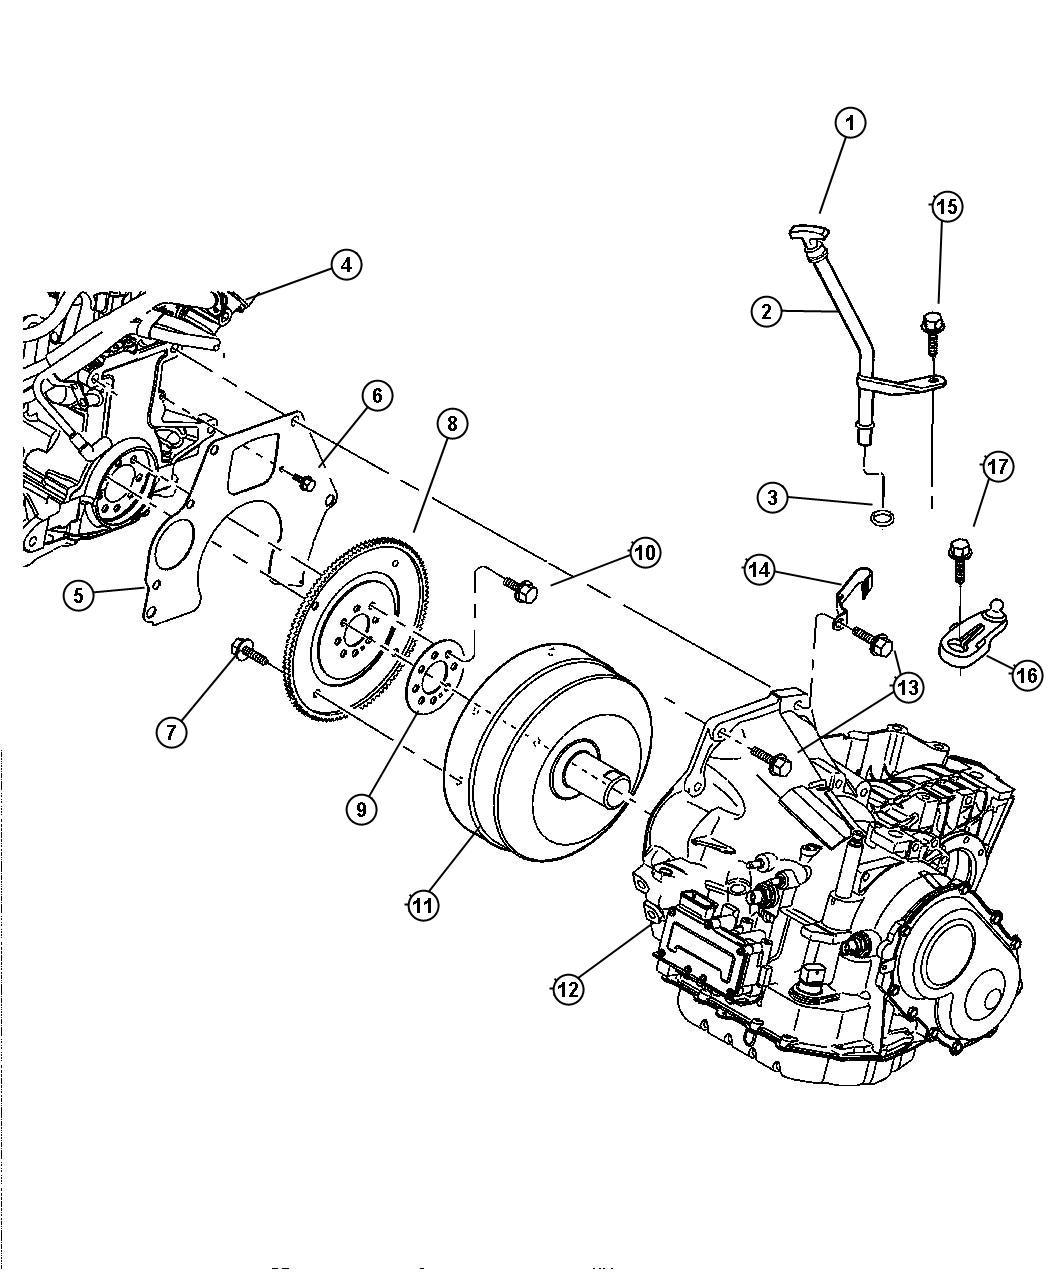 Dodge Neon Indicator. Transmission fluid level